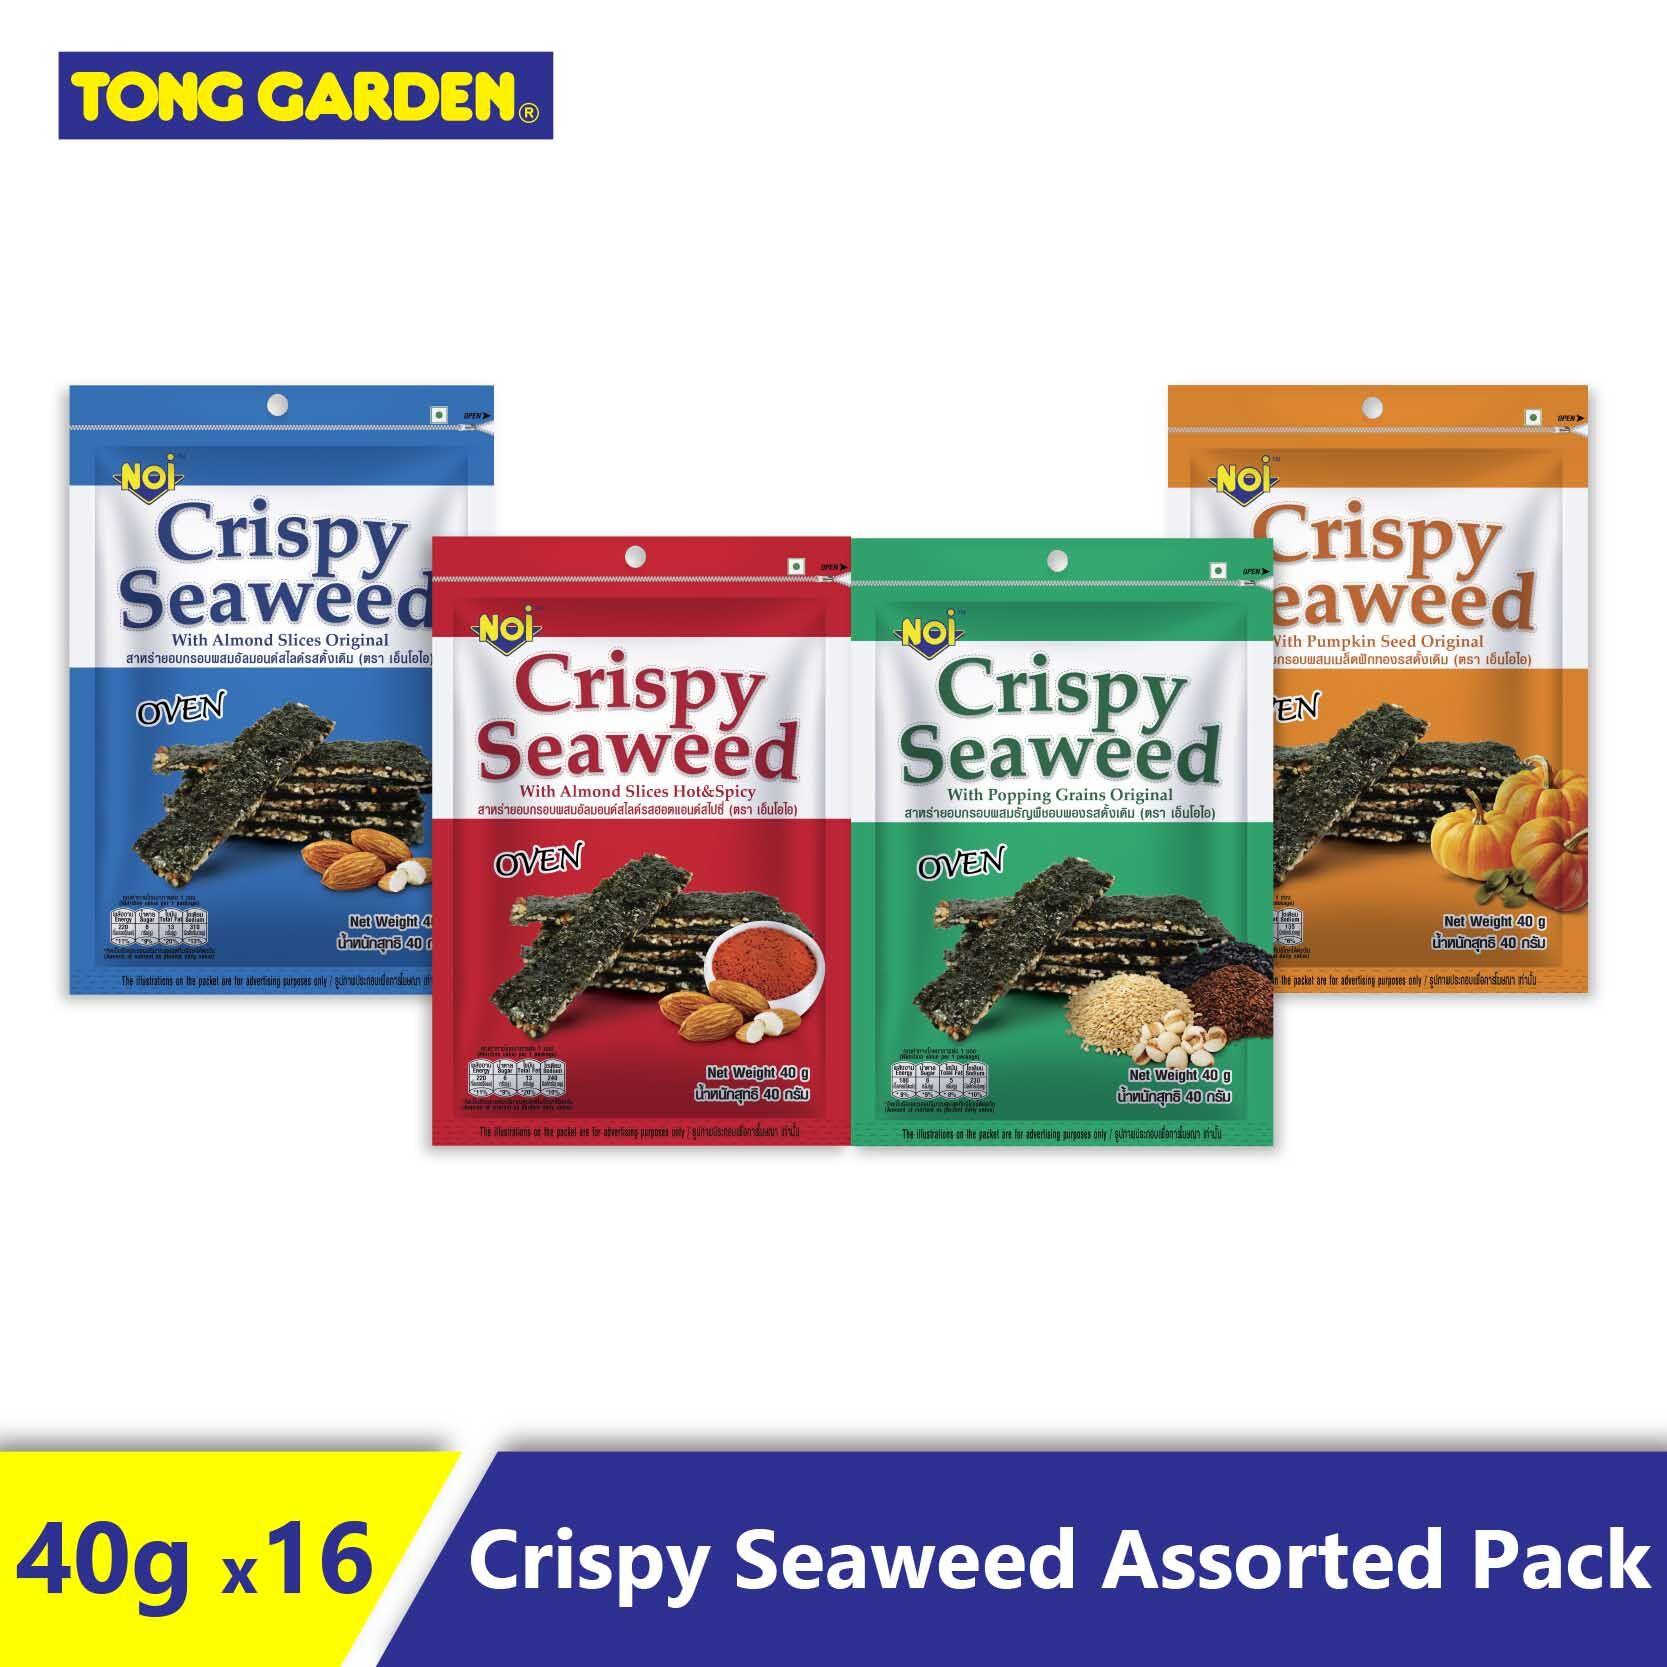 Noi Crispy Seaweed Assorted Pack 40g x 16 [Carton]